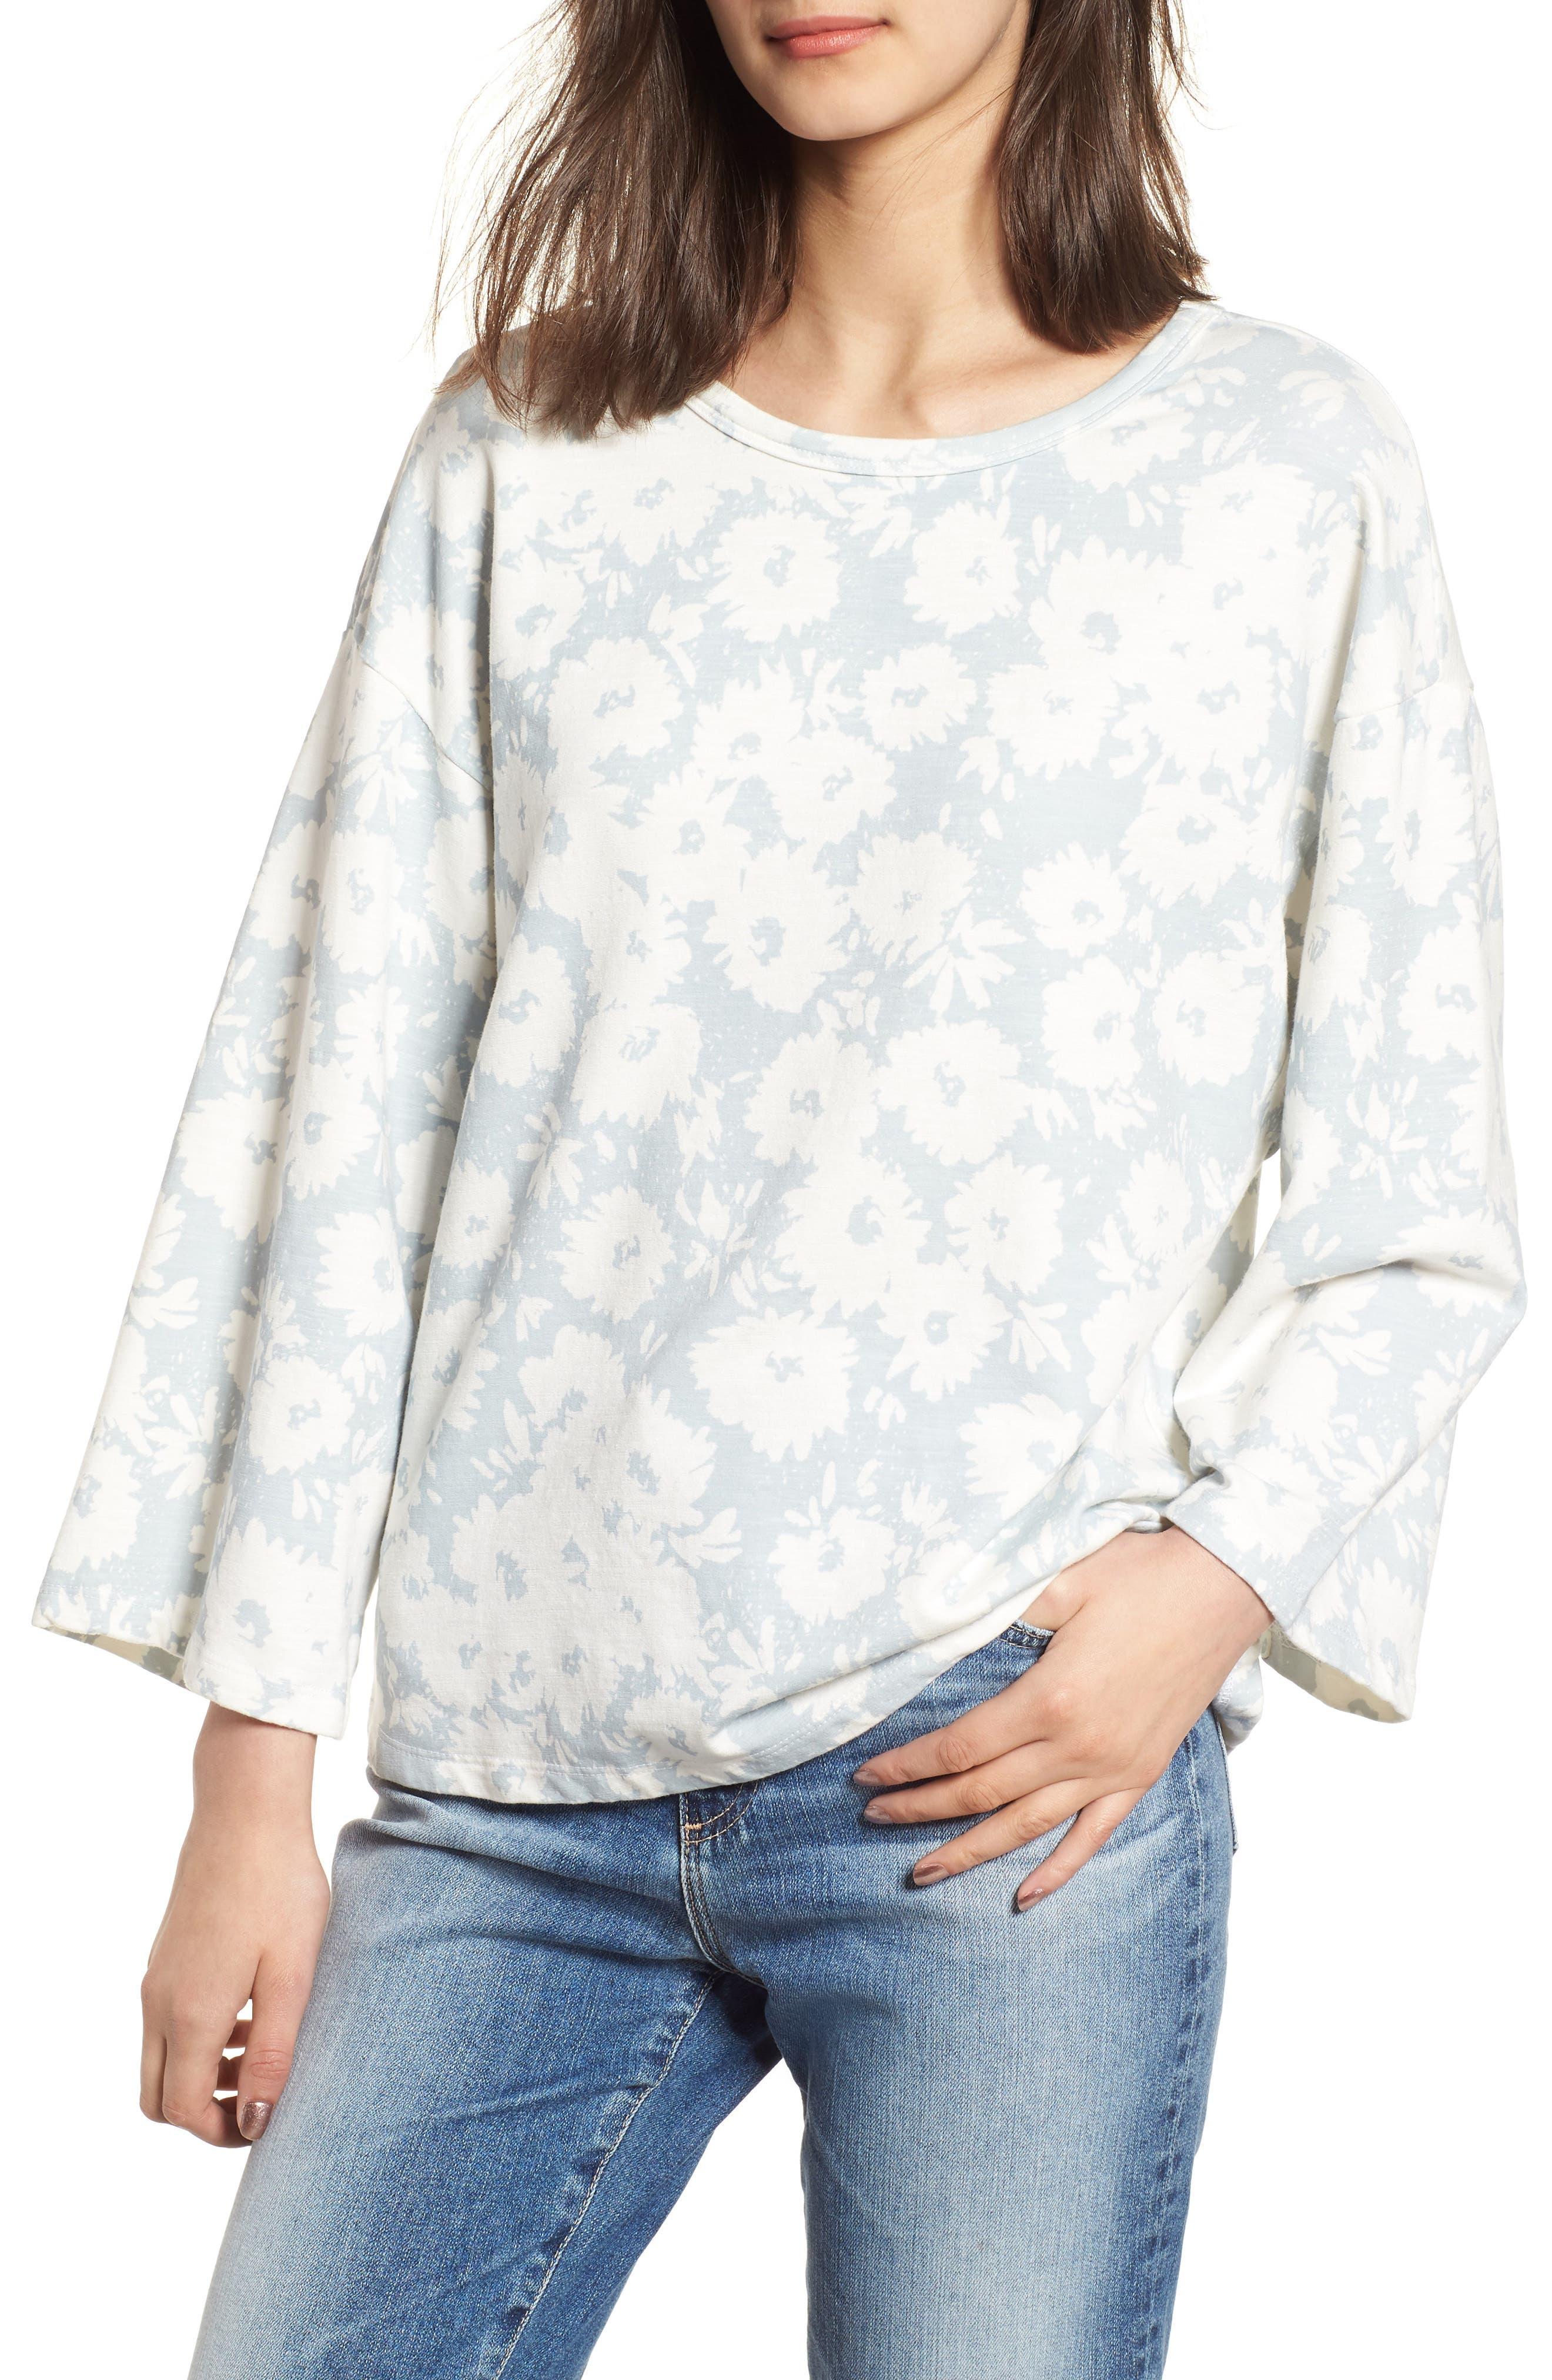 Kimono Sweatshirt,                             Main thumbnail 1, color,                             Sky/ White